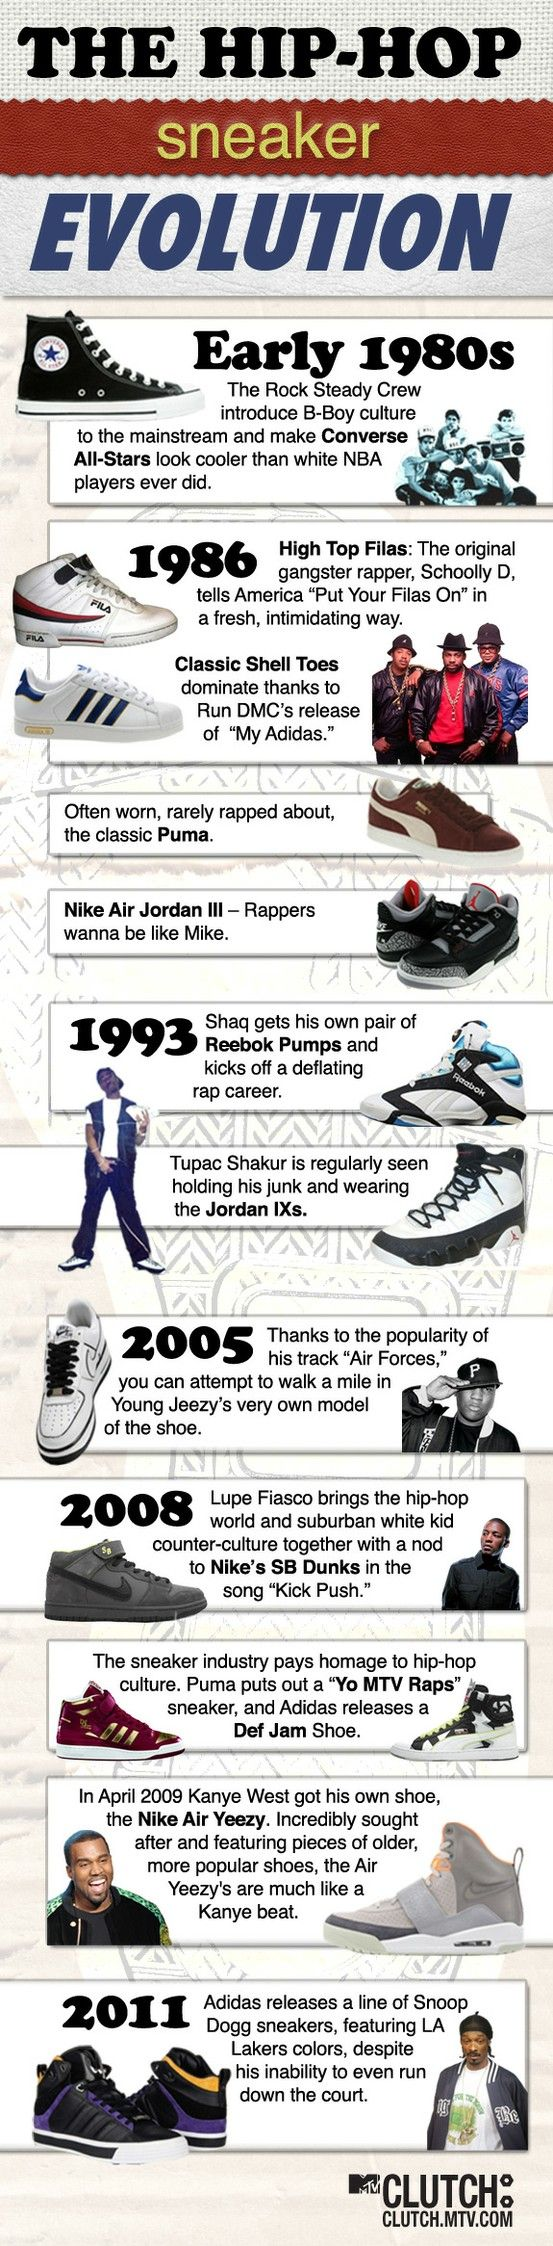 The #HIP-HOP #sneaker evolution. Now...The DanceSocks!